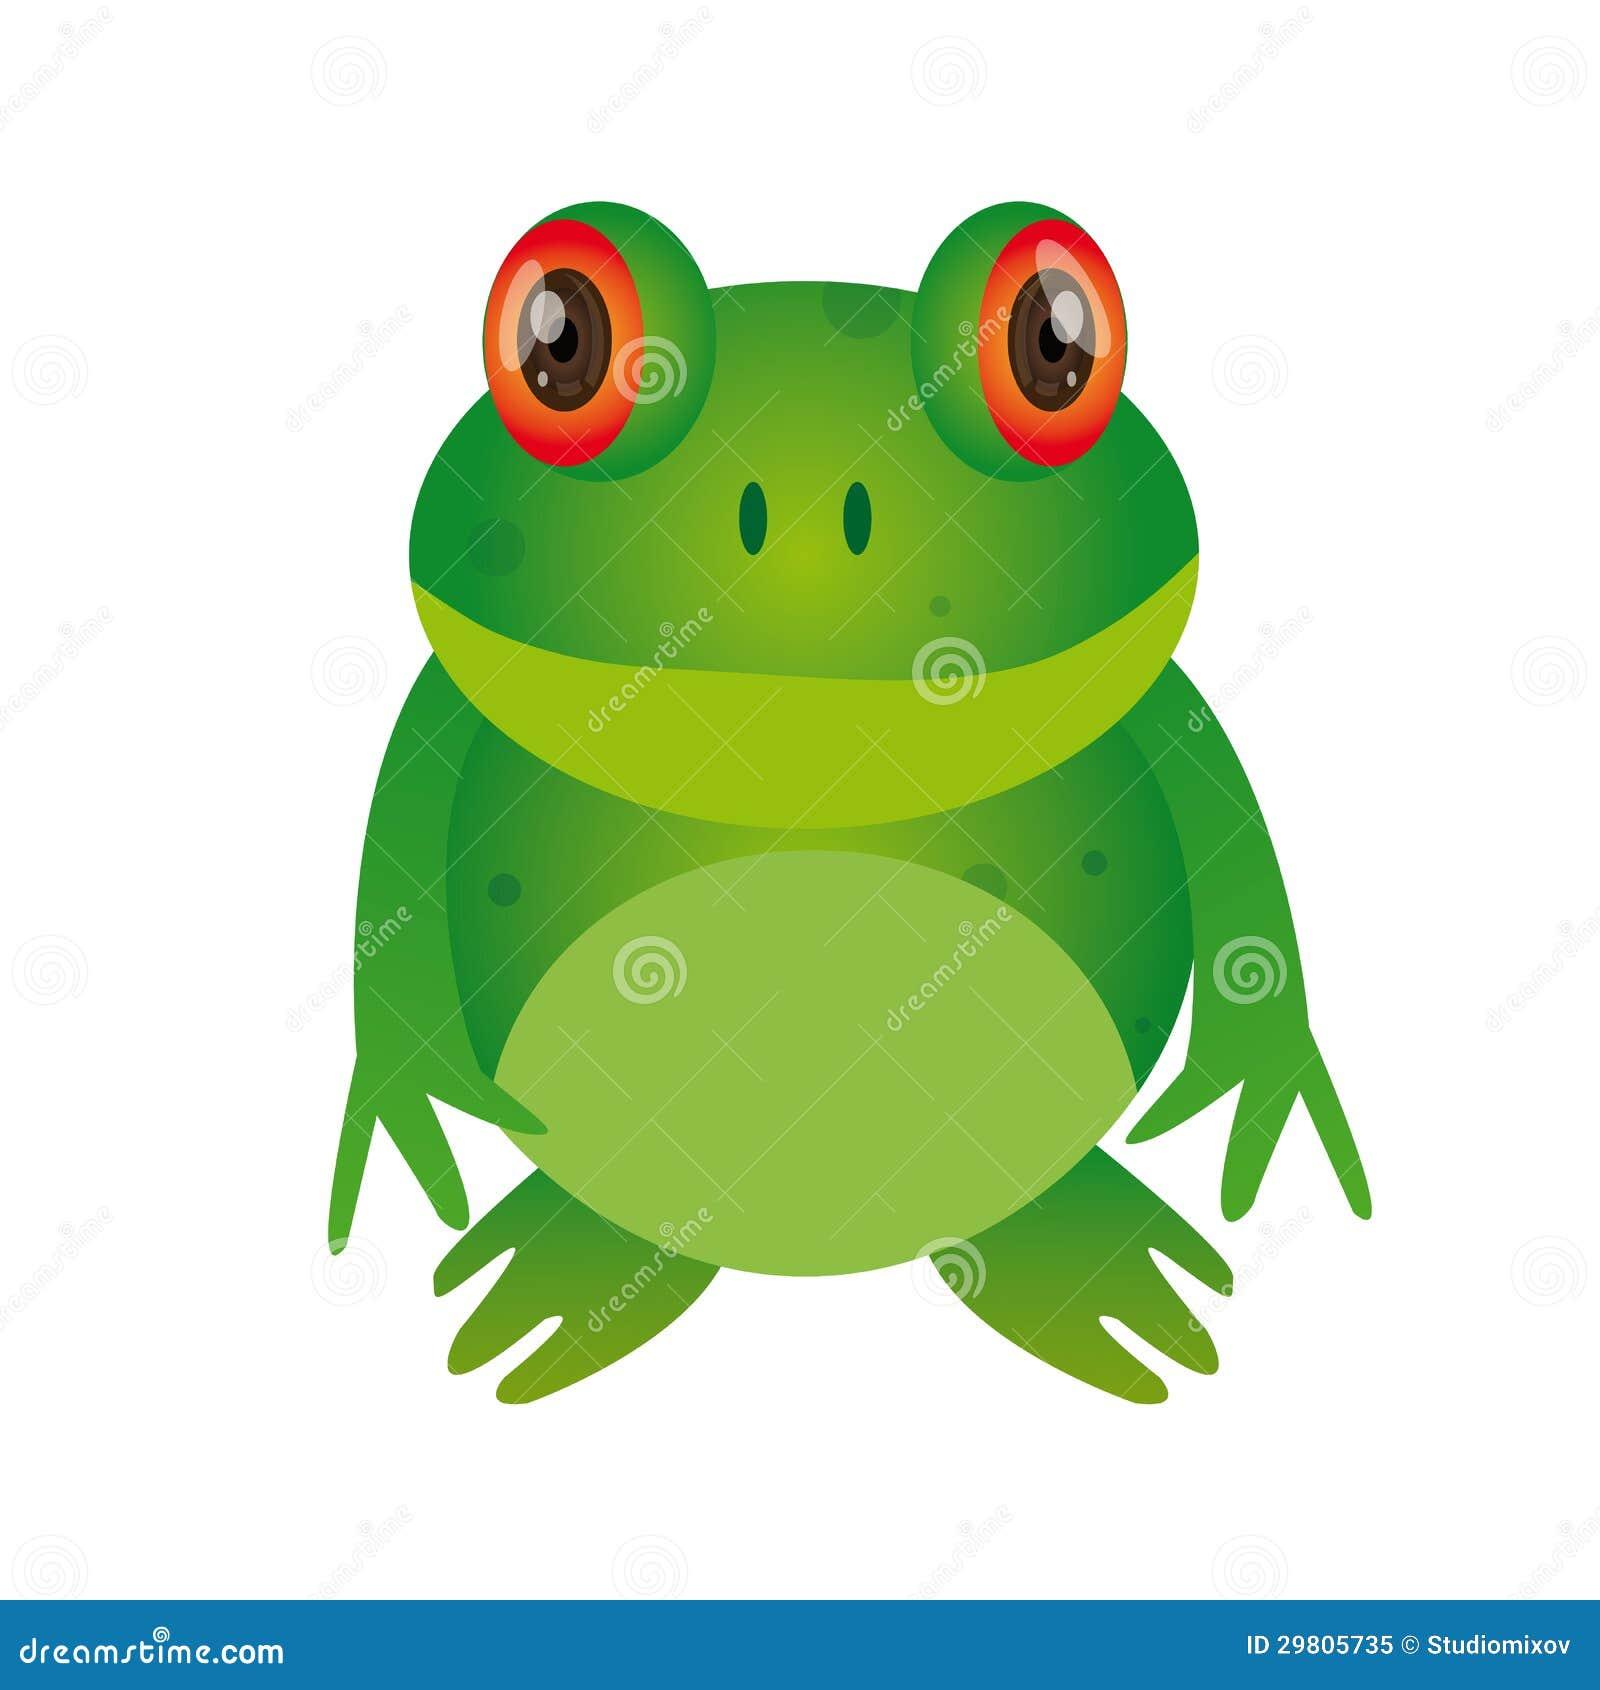 Frog Cartoon Royalty Free Stock Photo - Image: 29805735